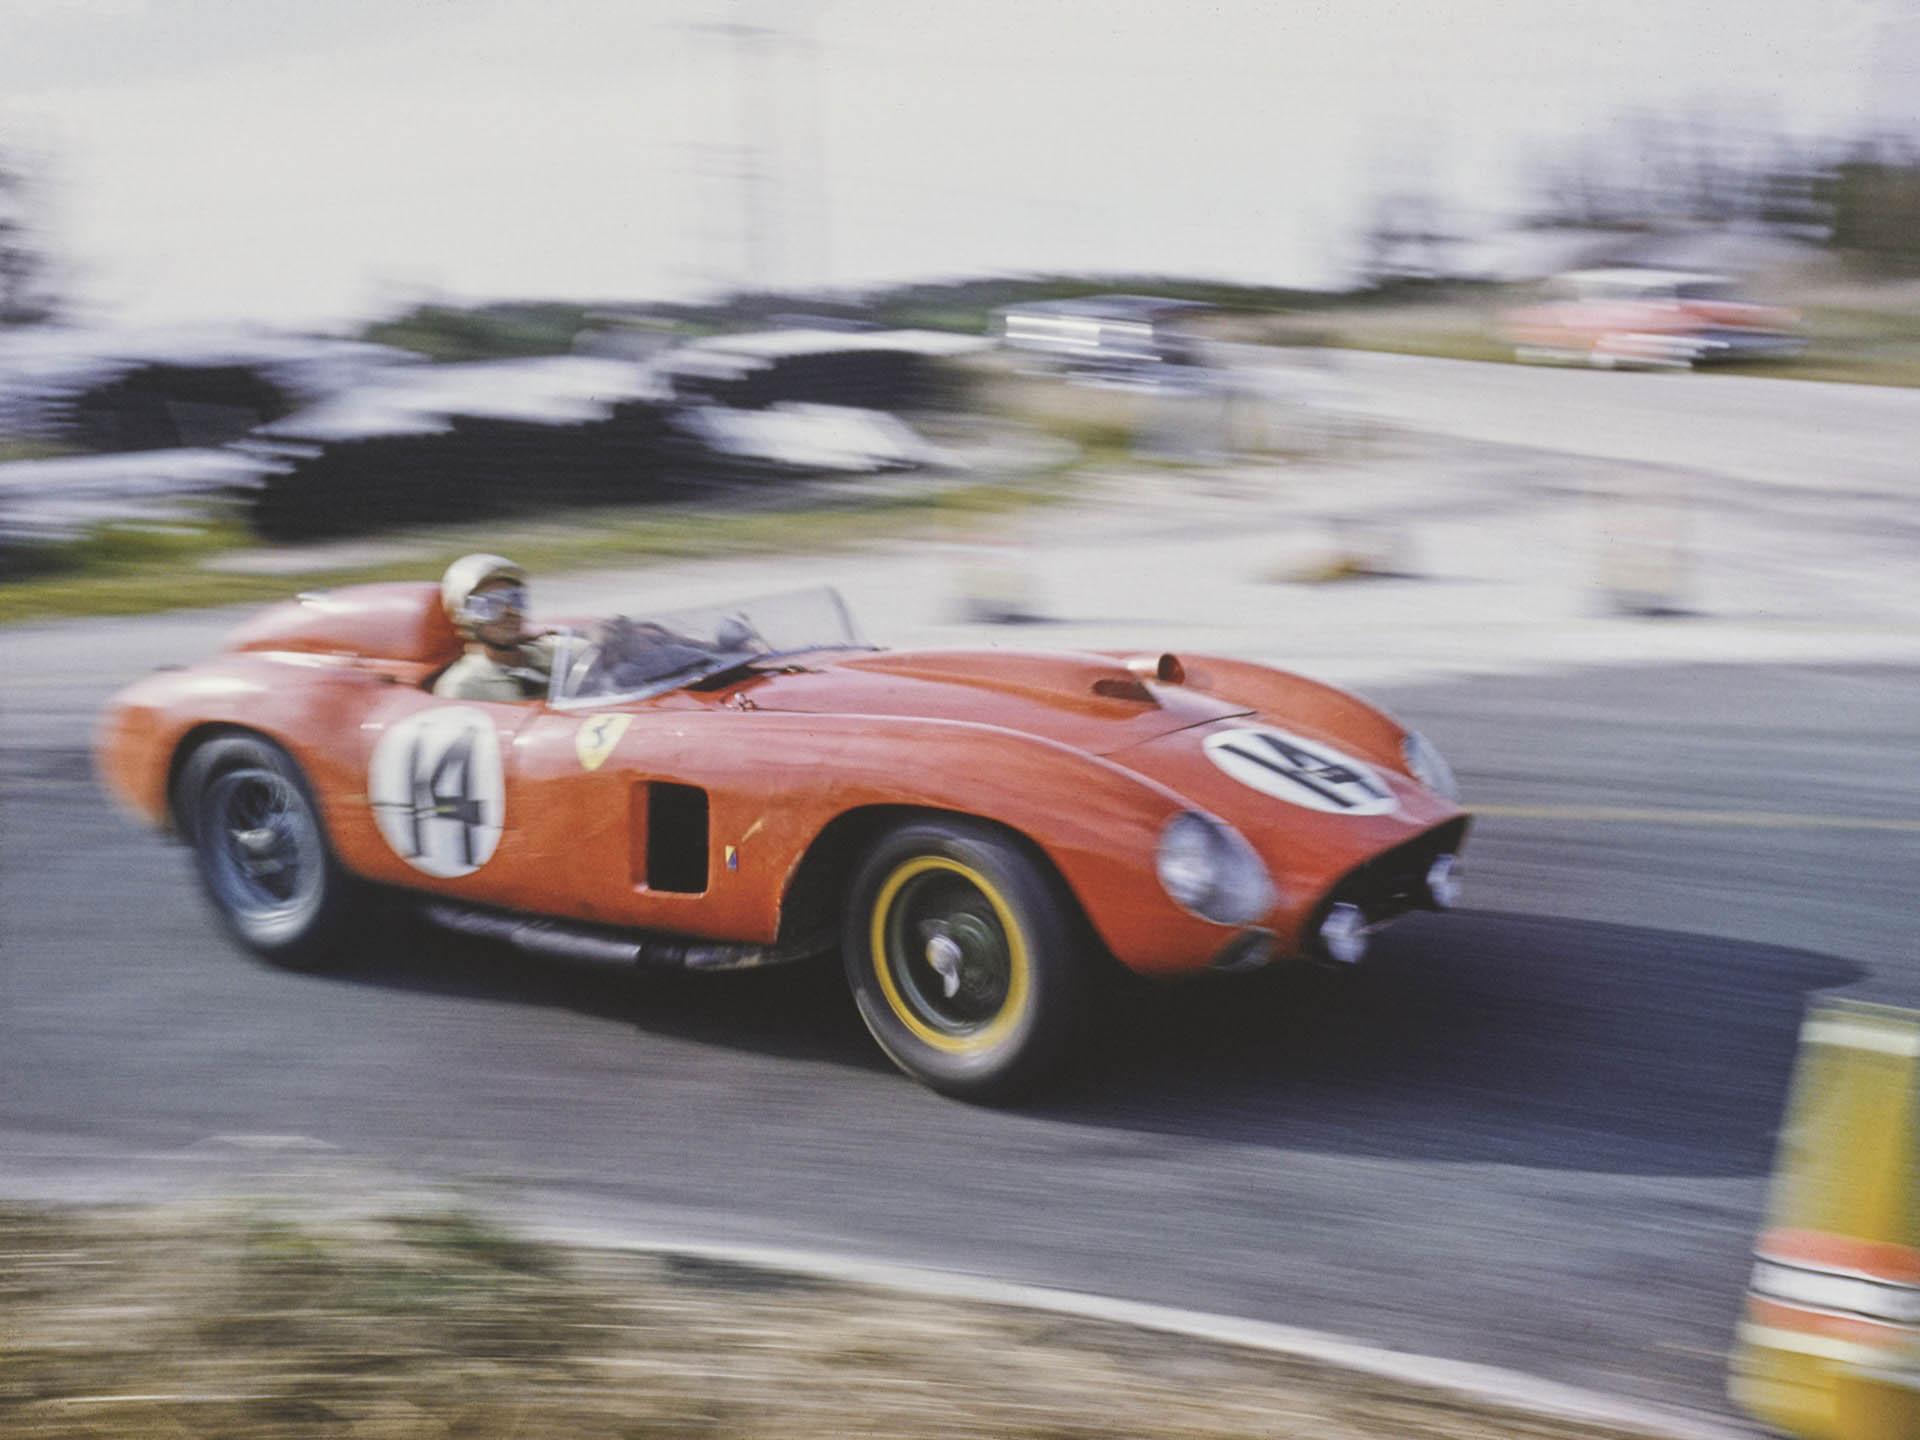 1956 Ferrari 290 MM racing